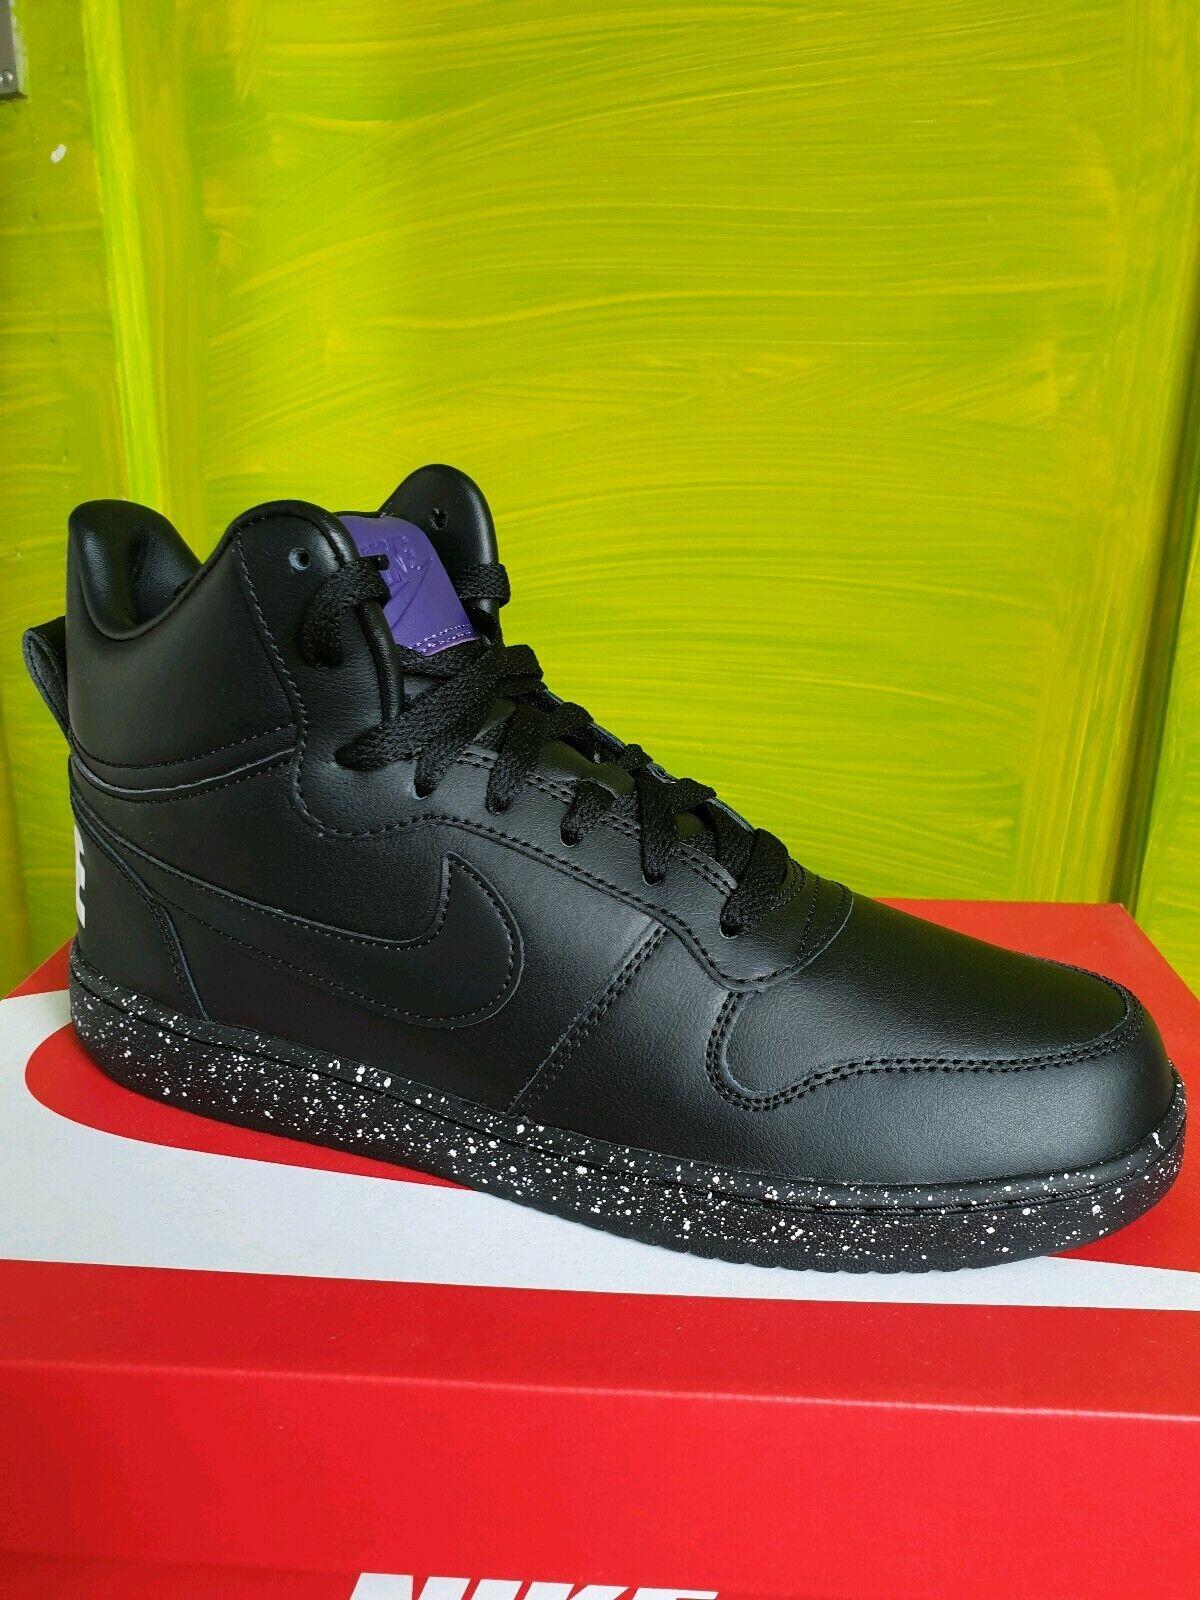 Nike Turnschuhe , schwarz , sport, court bGoldugh mid , 916759 001 Gr.42 ,UK 7,5